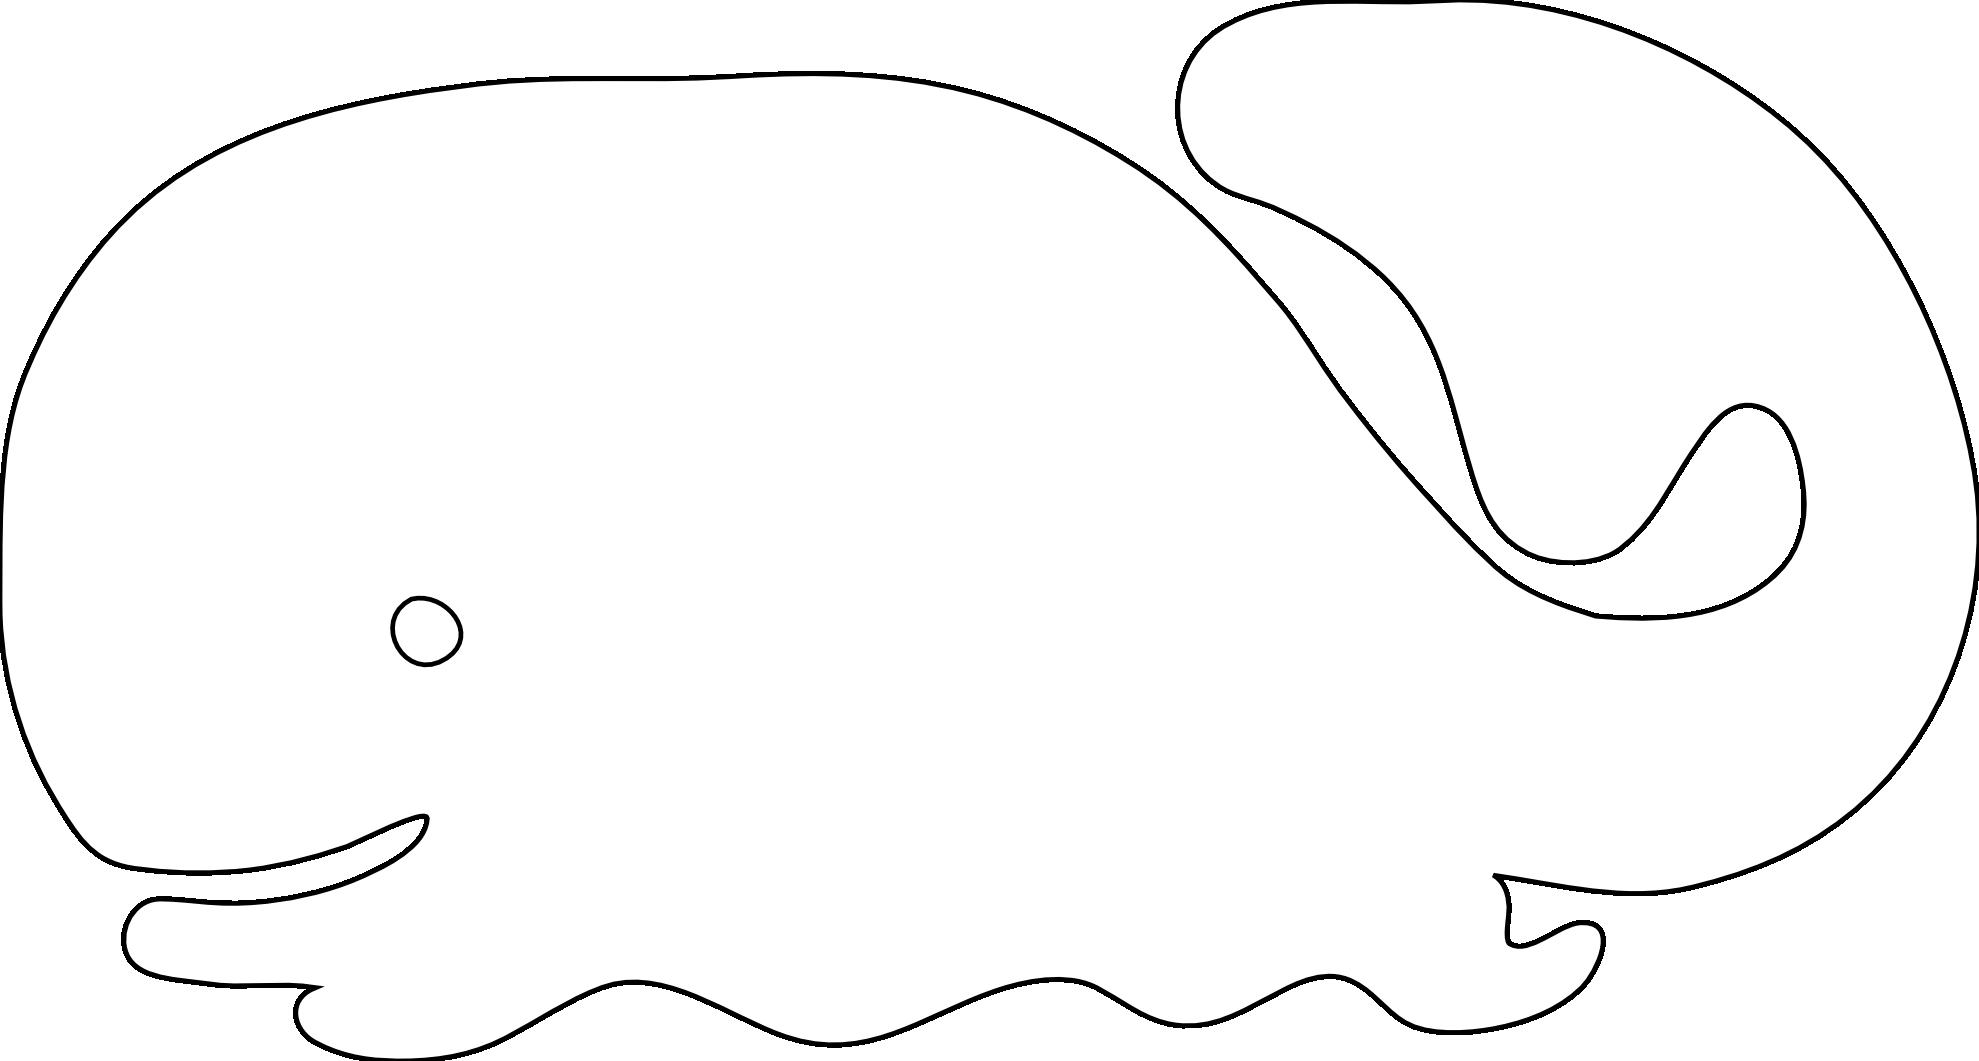 Whale cartoon clip art image 2